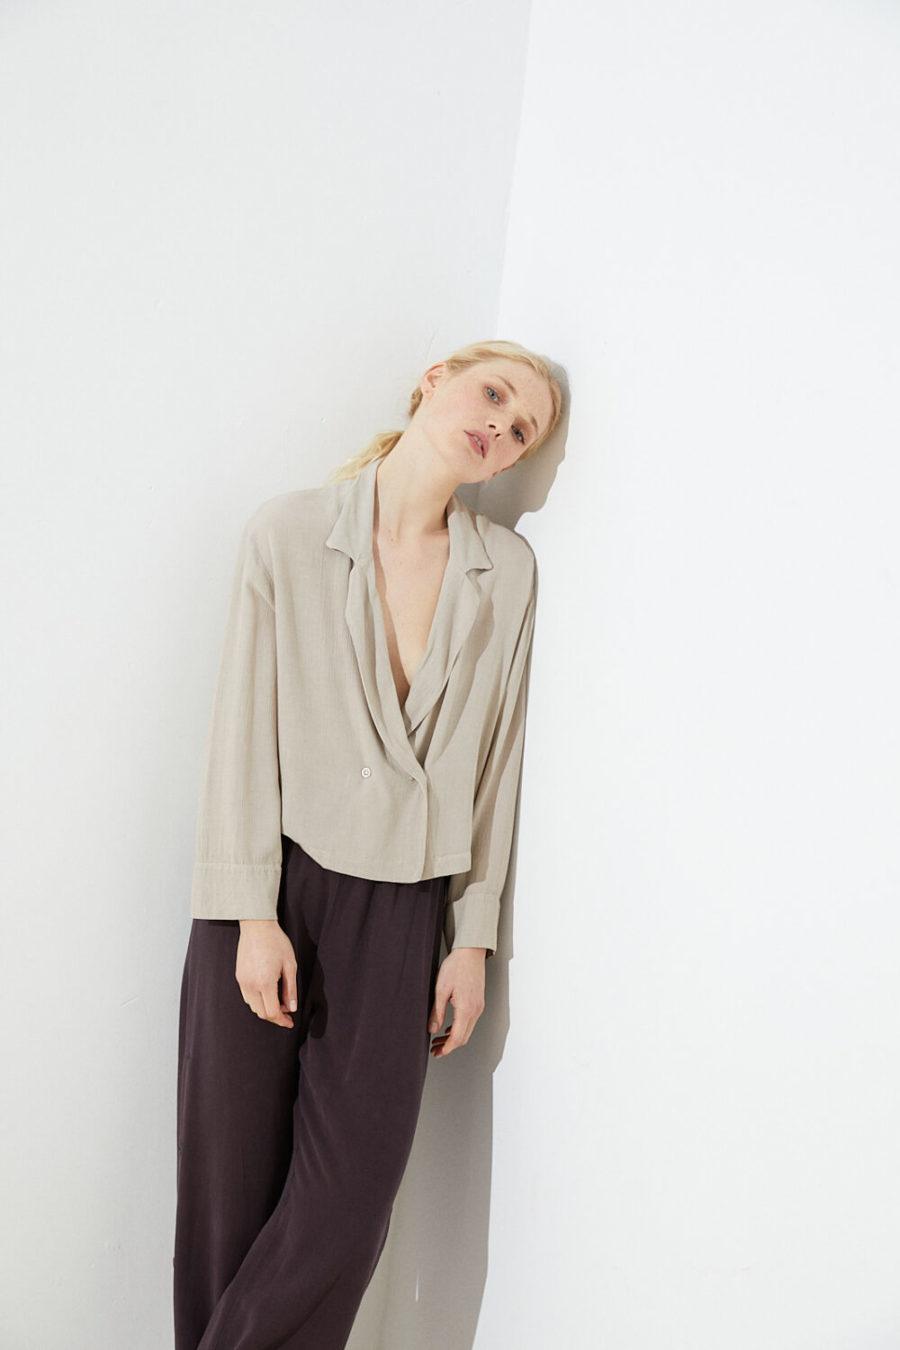 CUS - Tayri Ecovero Shirt